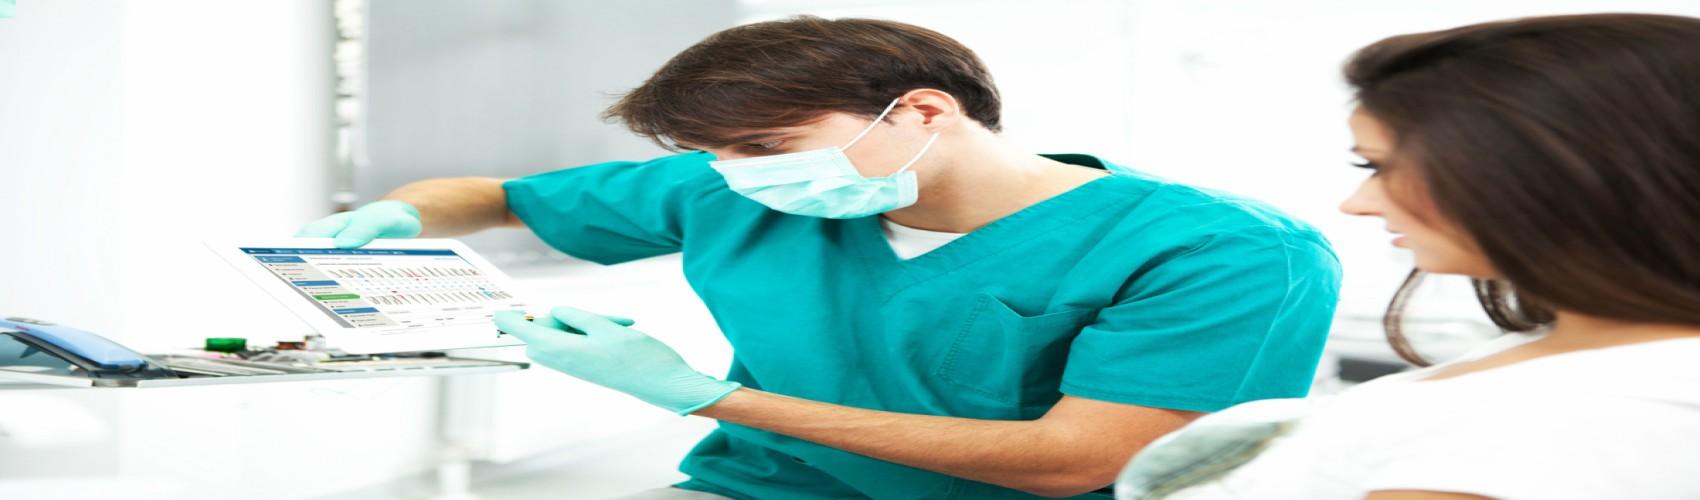 Odontólogo del siglo XXI